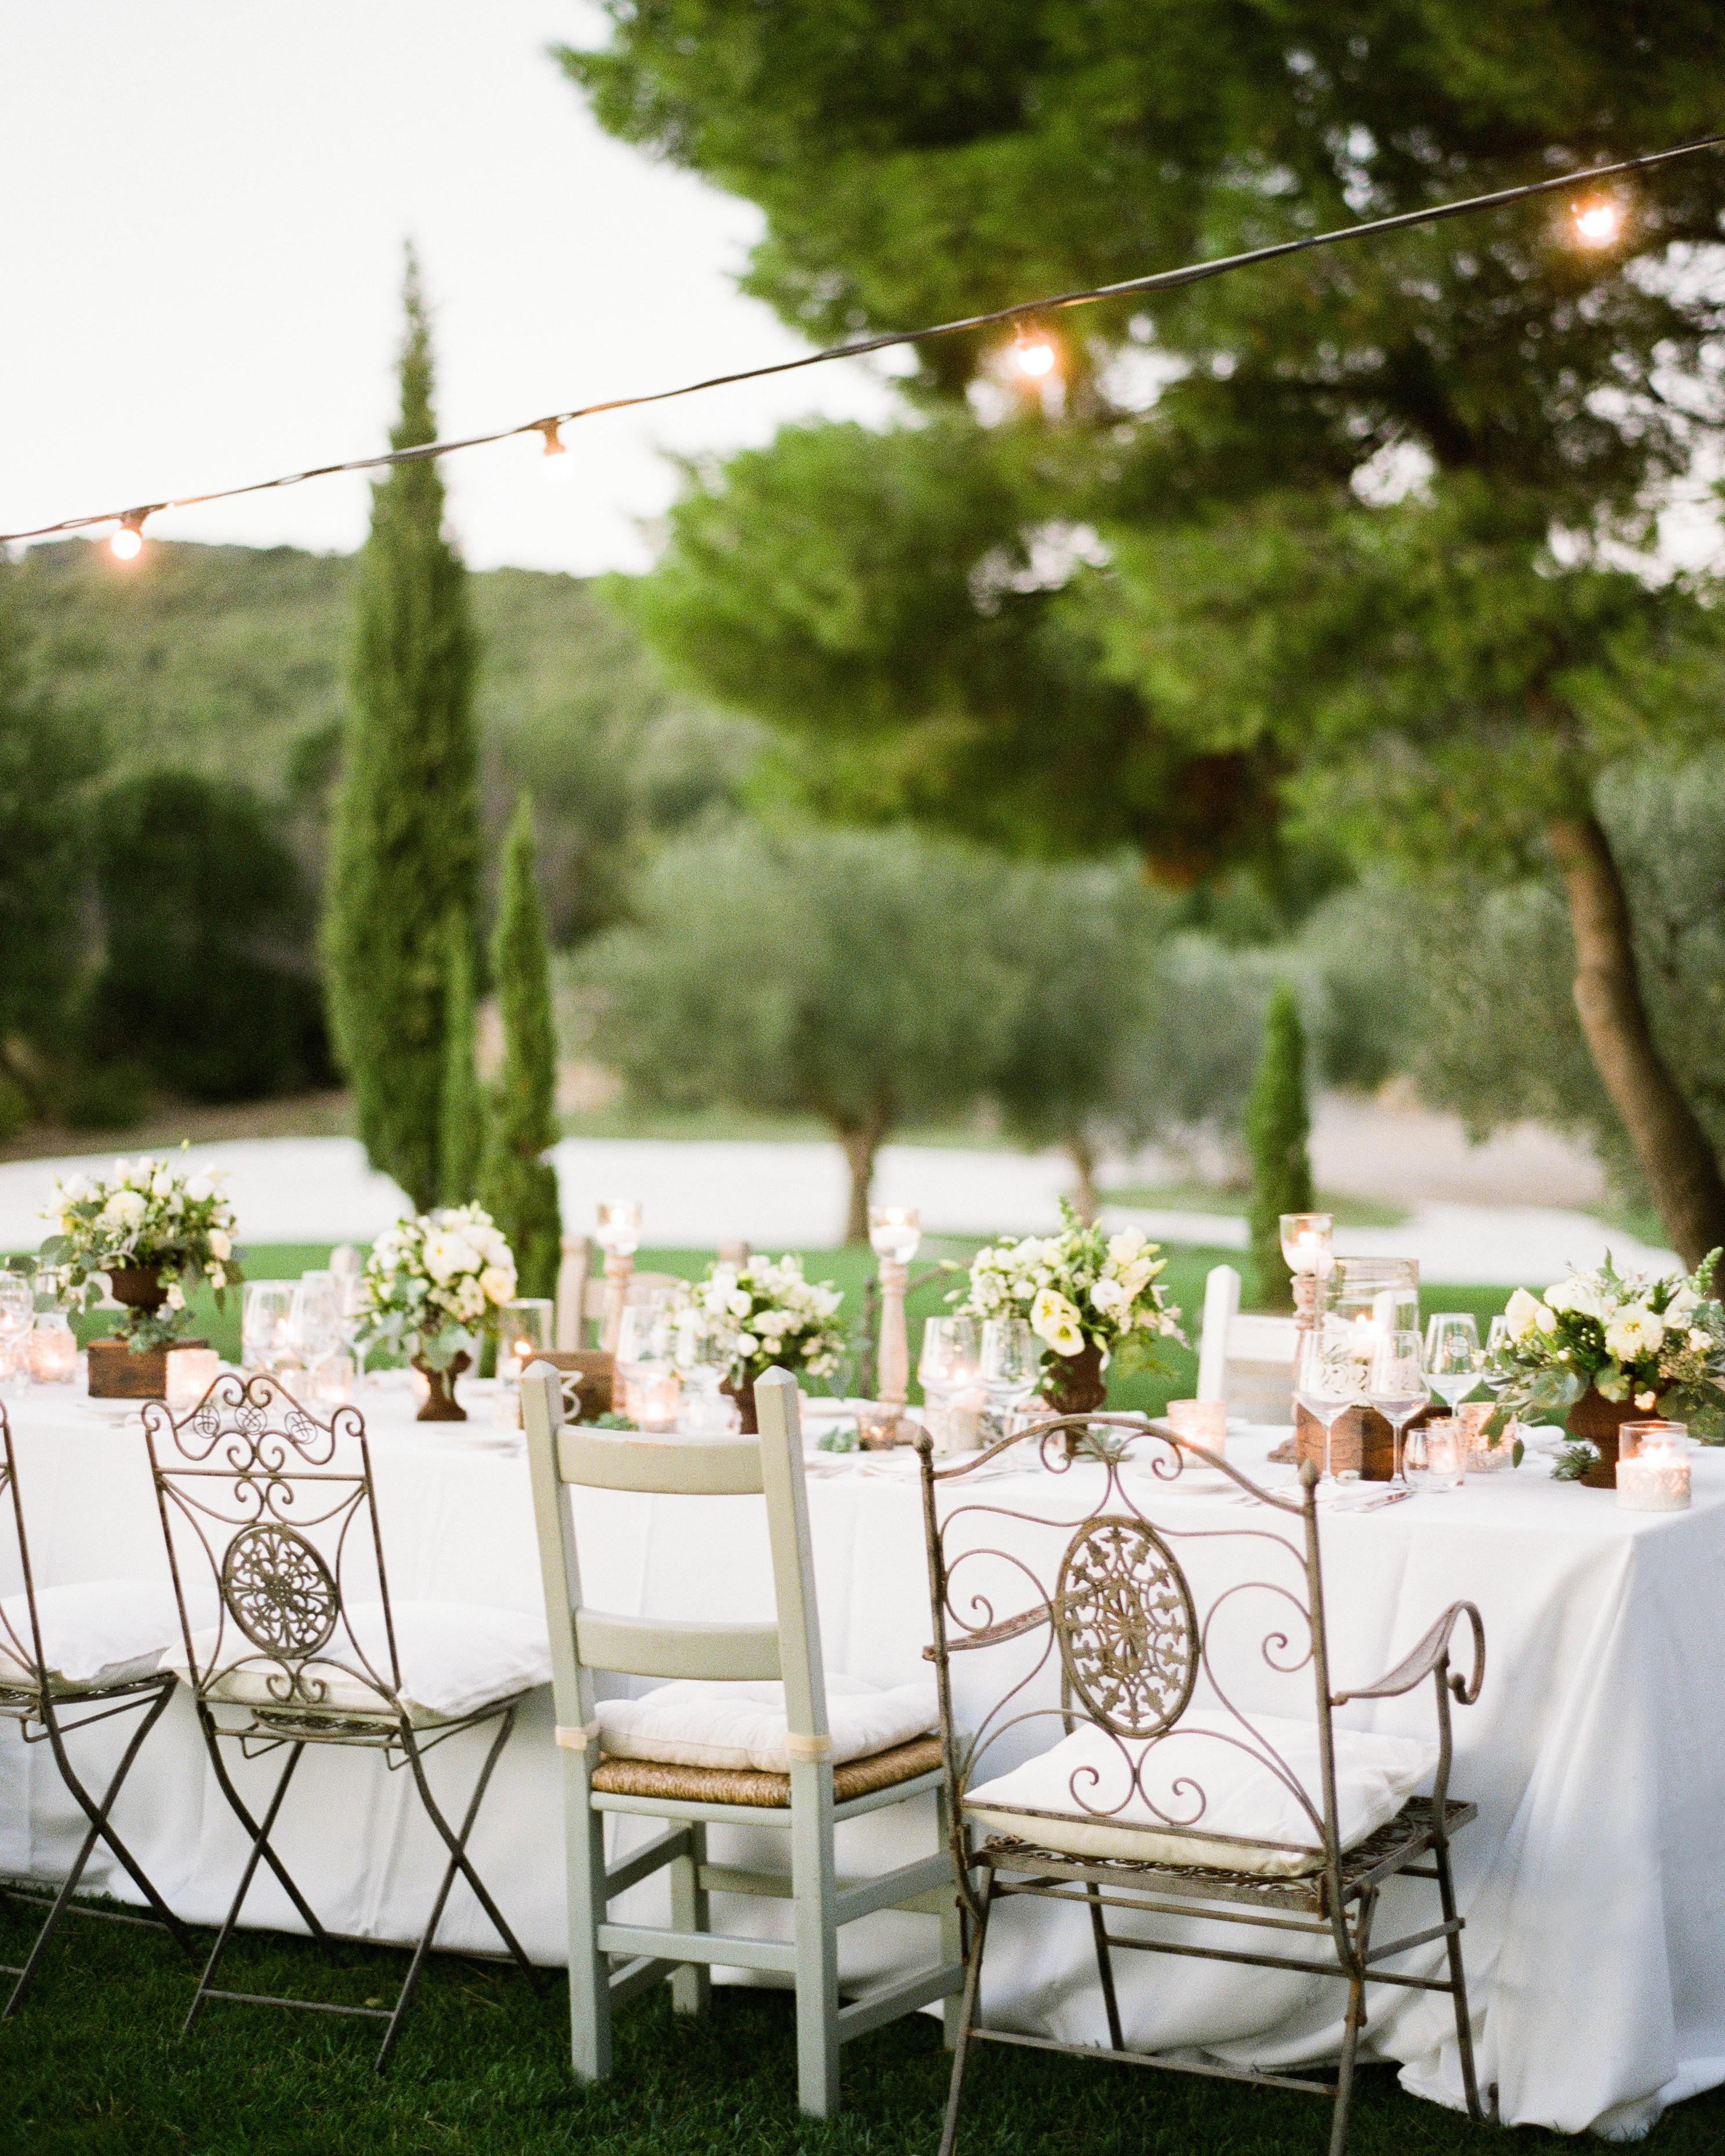 regina-jack-wedding-table-75-s111820-0215.jpg